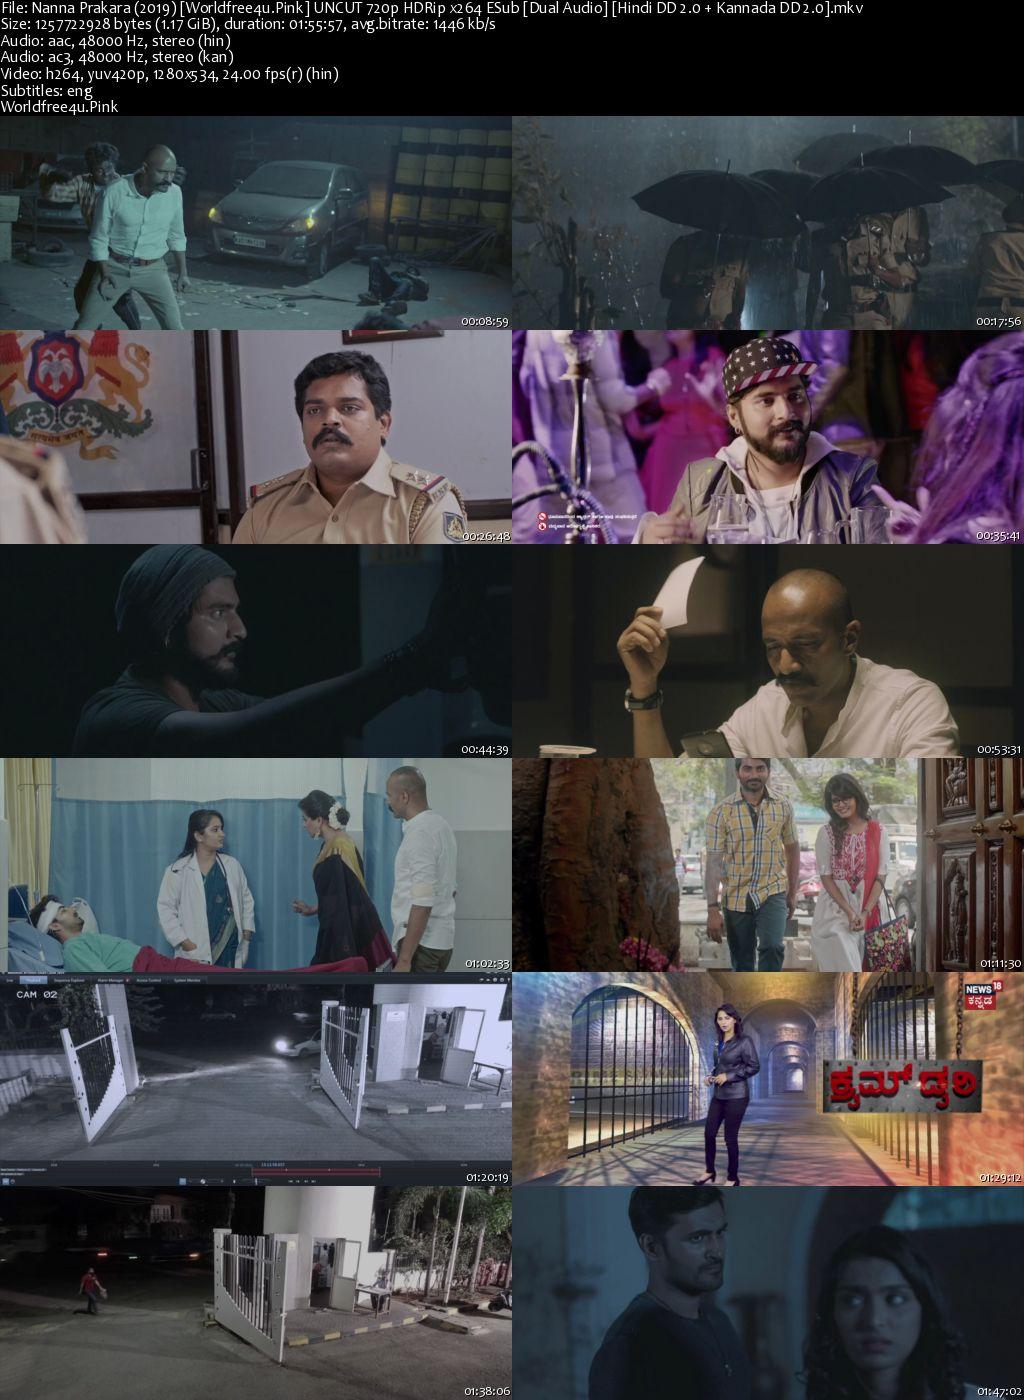 Nanna Prakara 2019 Hindi Dubbed HDRip 720p